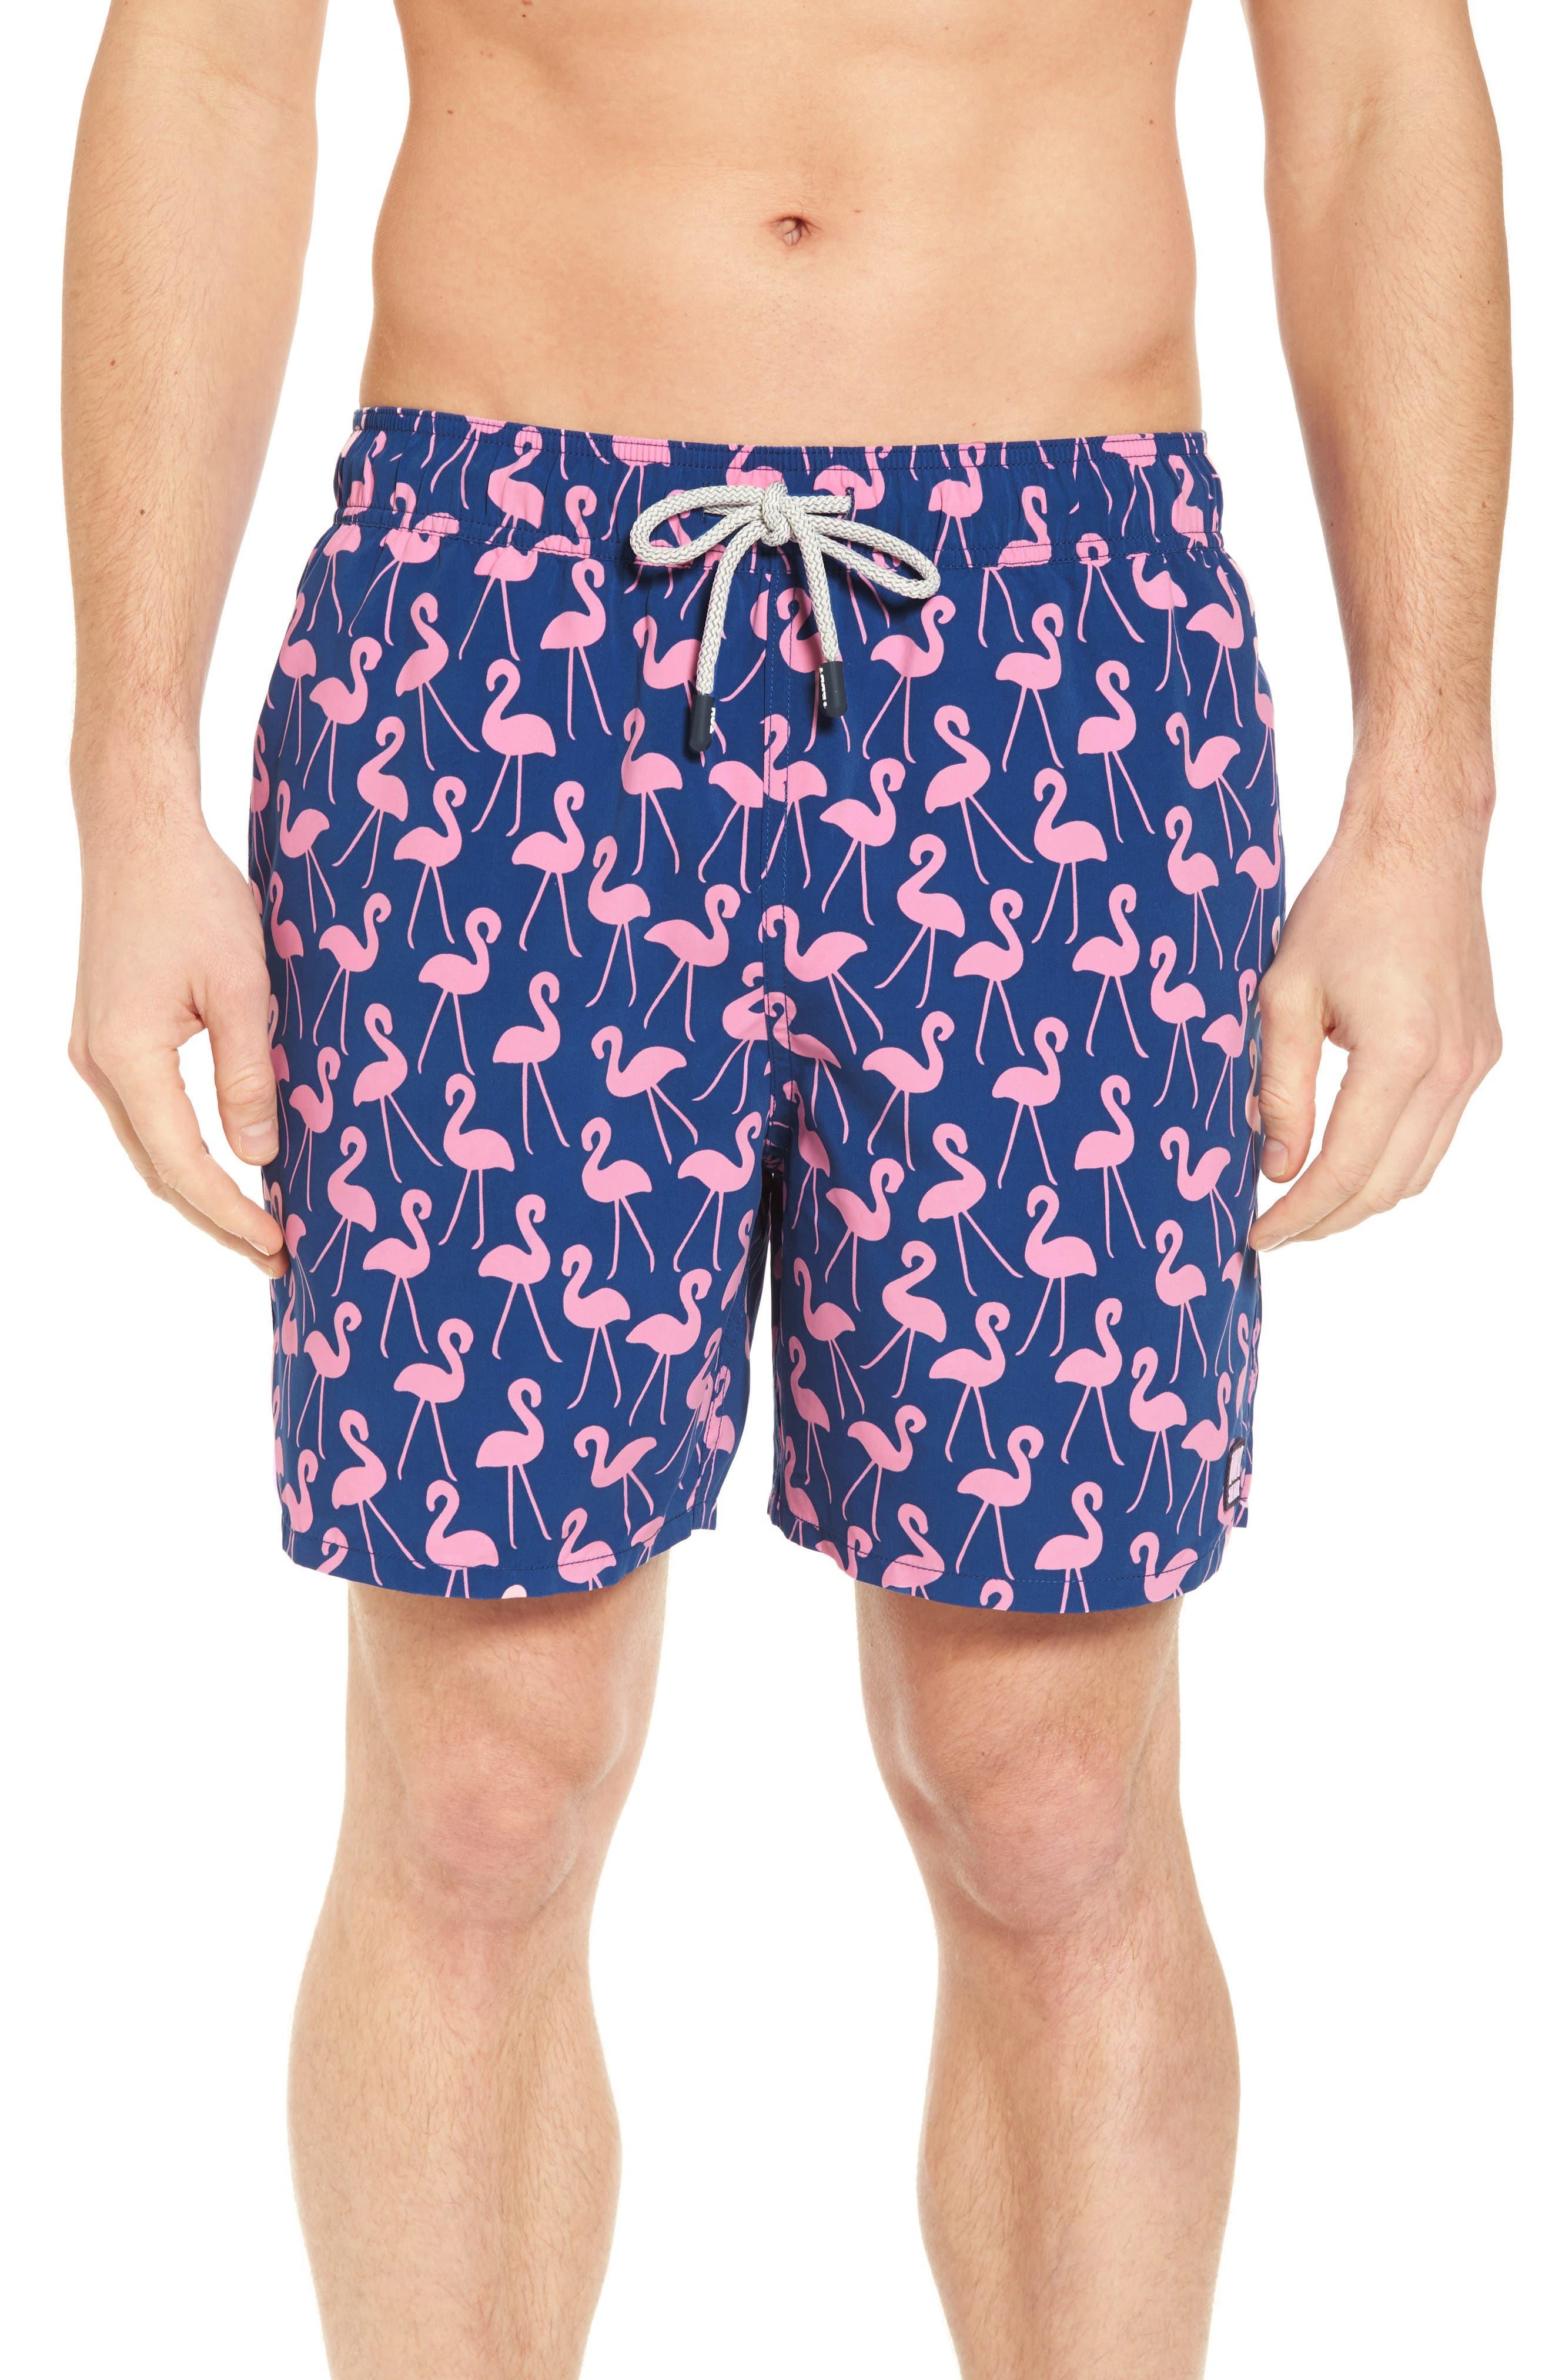 5537c6e73c02 Men's Tom & Teddy Swimwear, Boardshorts & Swim Trunks   Nordstrom